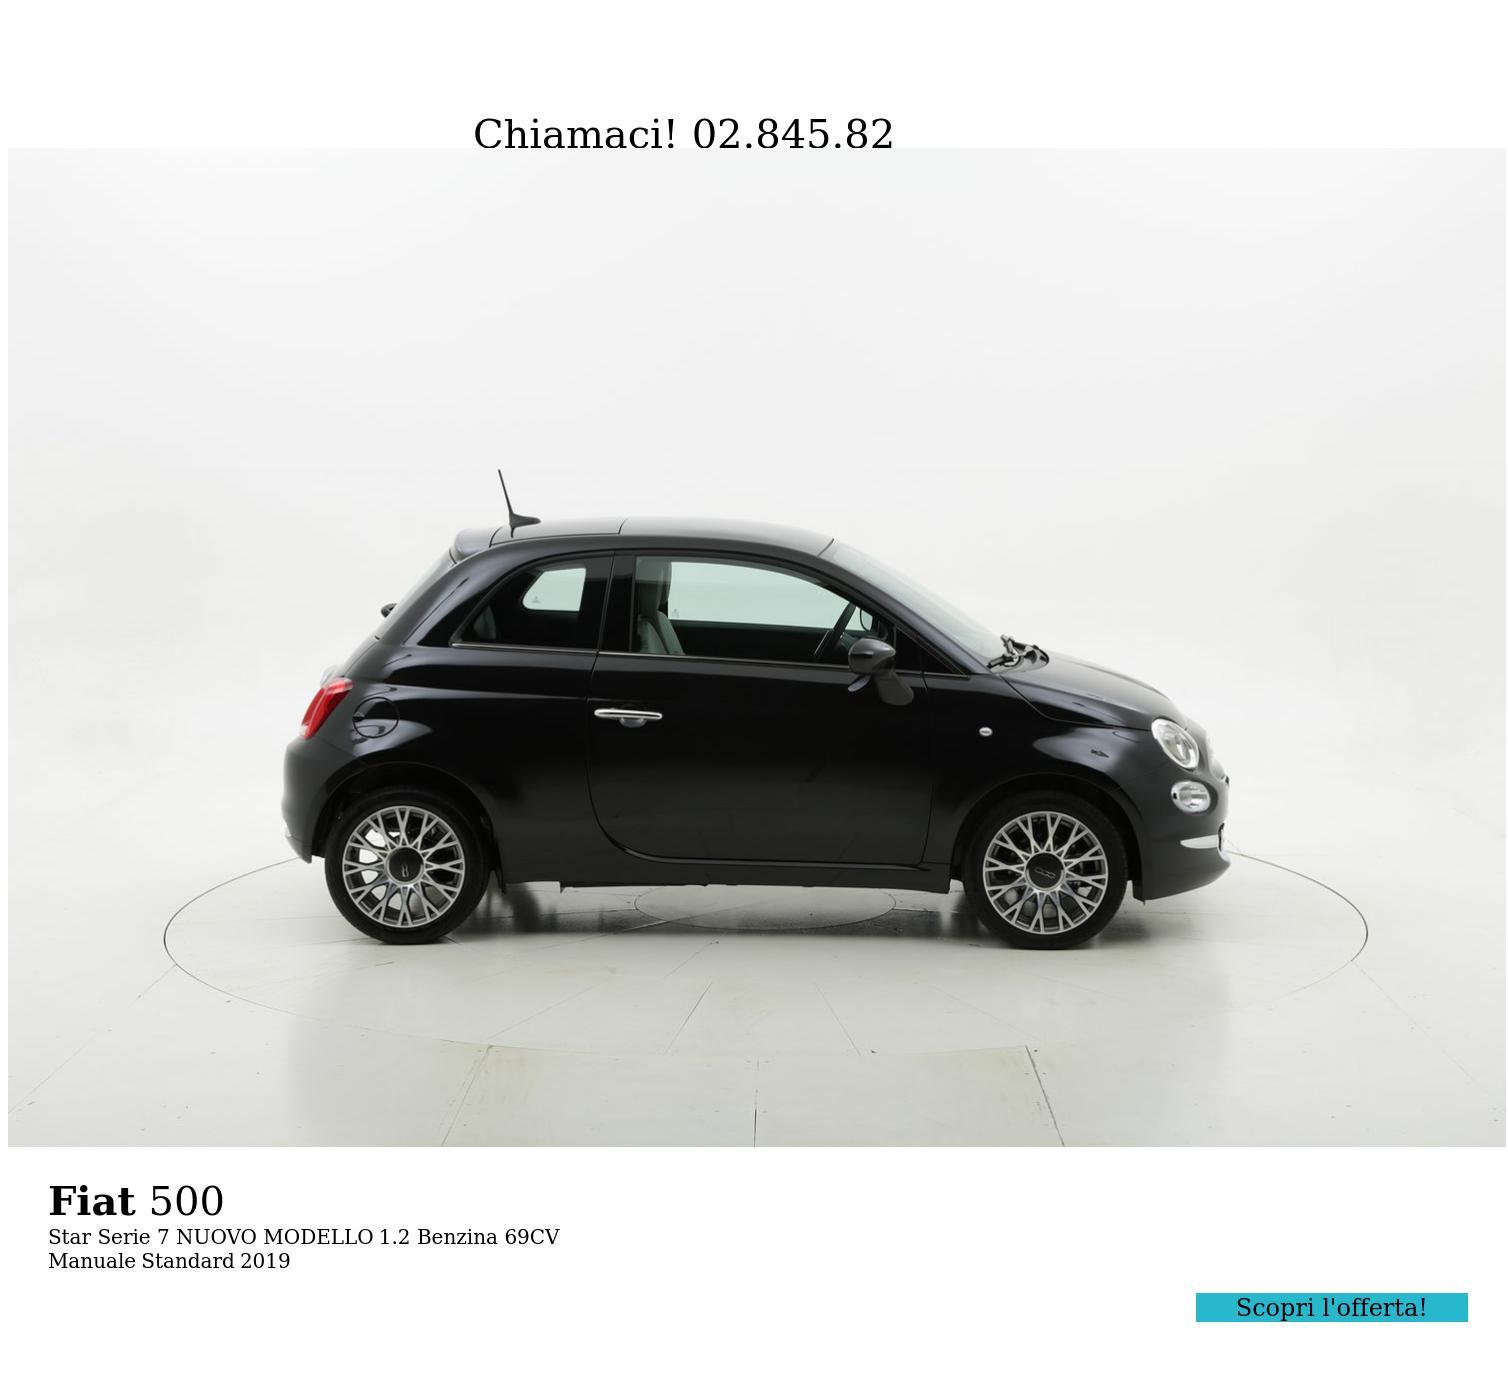 Fiat 500 Star Serie 7 NUOVO MODELLO km 0 benzina nera | brumbrum